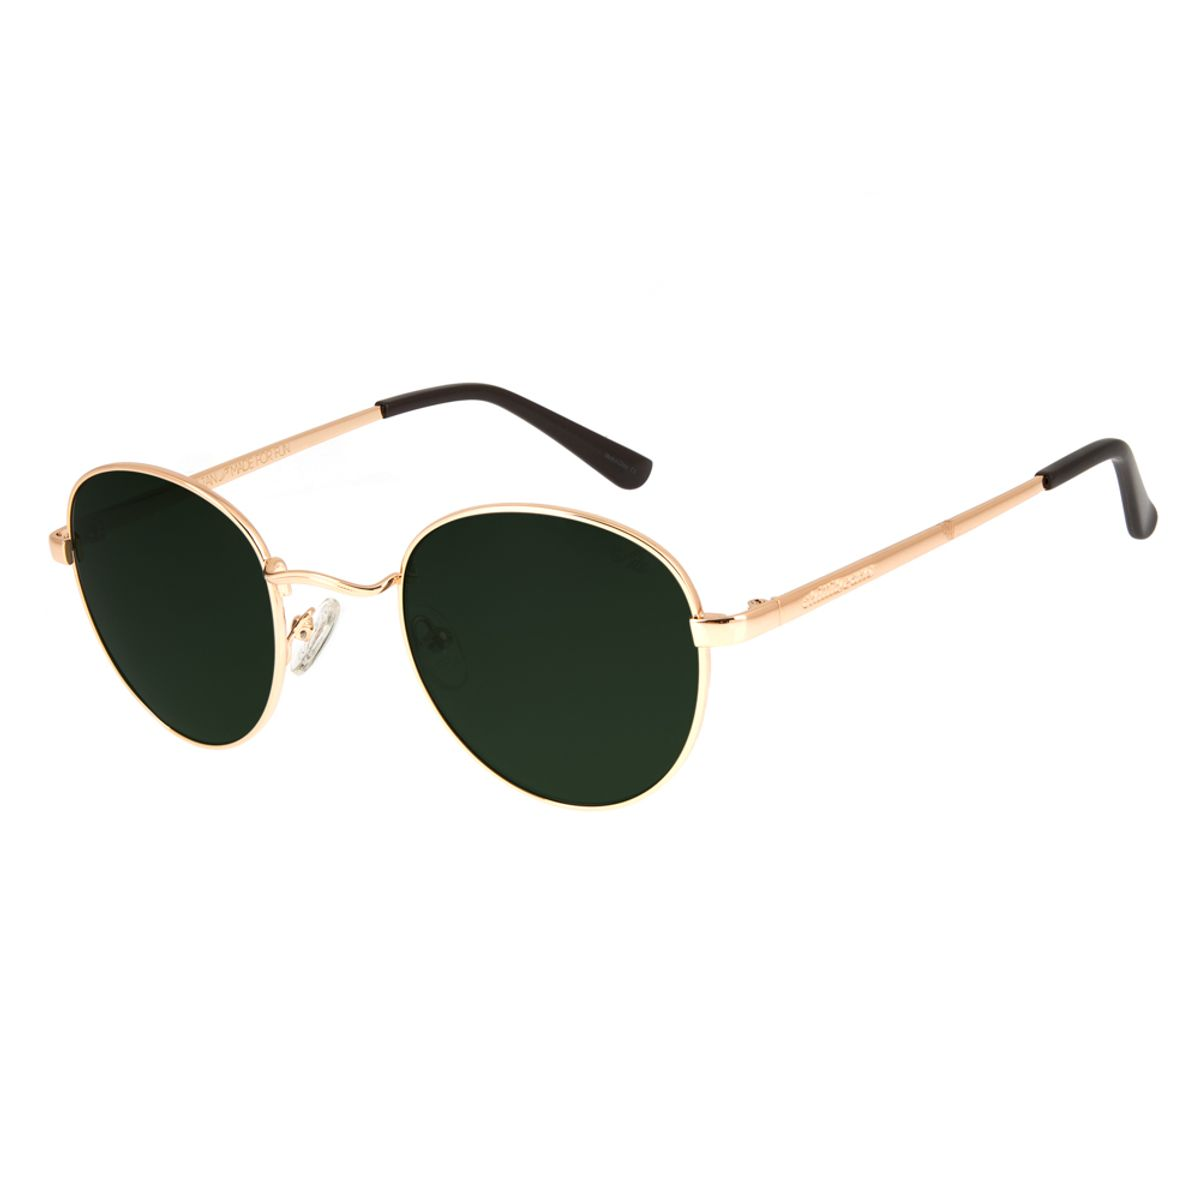 5f077f330 Óculos De Sol Chilli Beans Unissex Metal Redondo Dourado 2517 ...